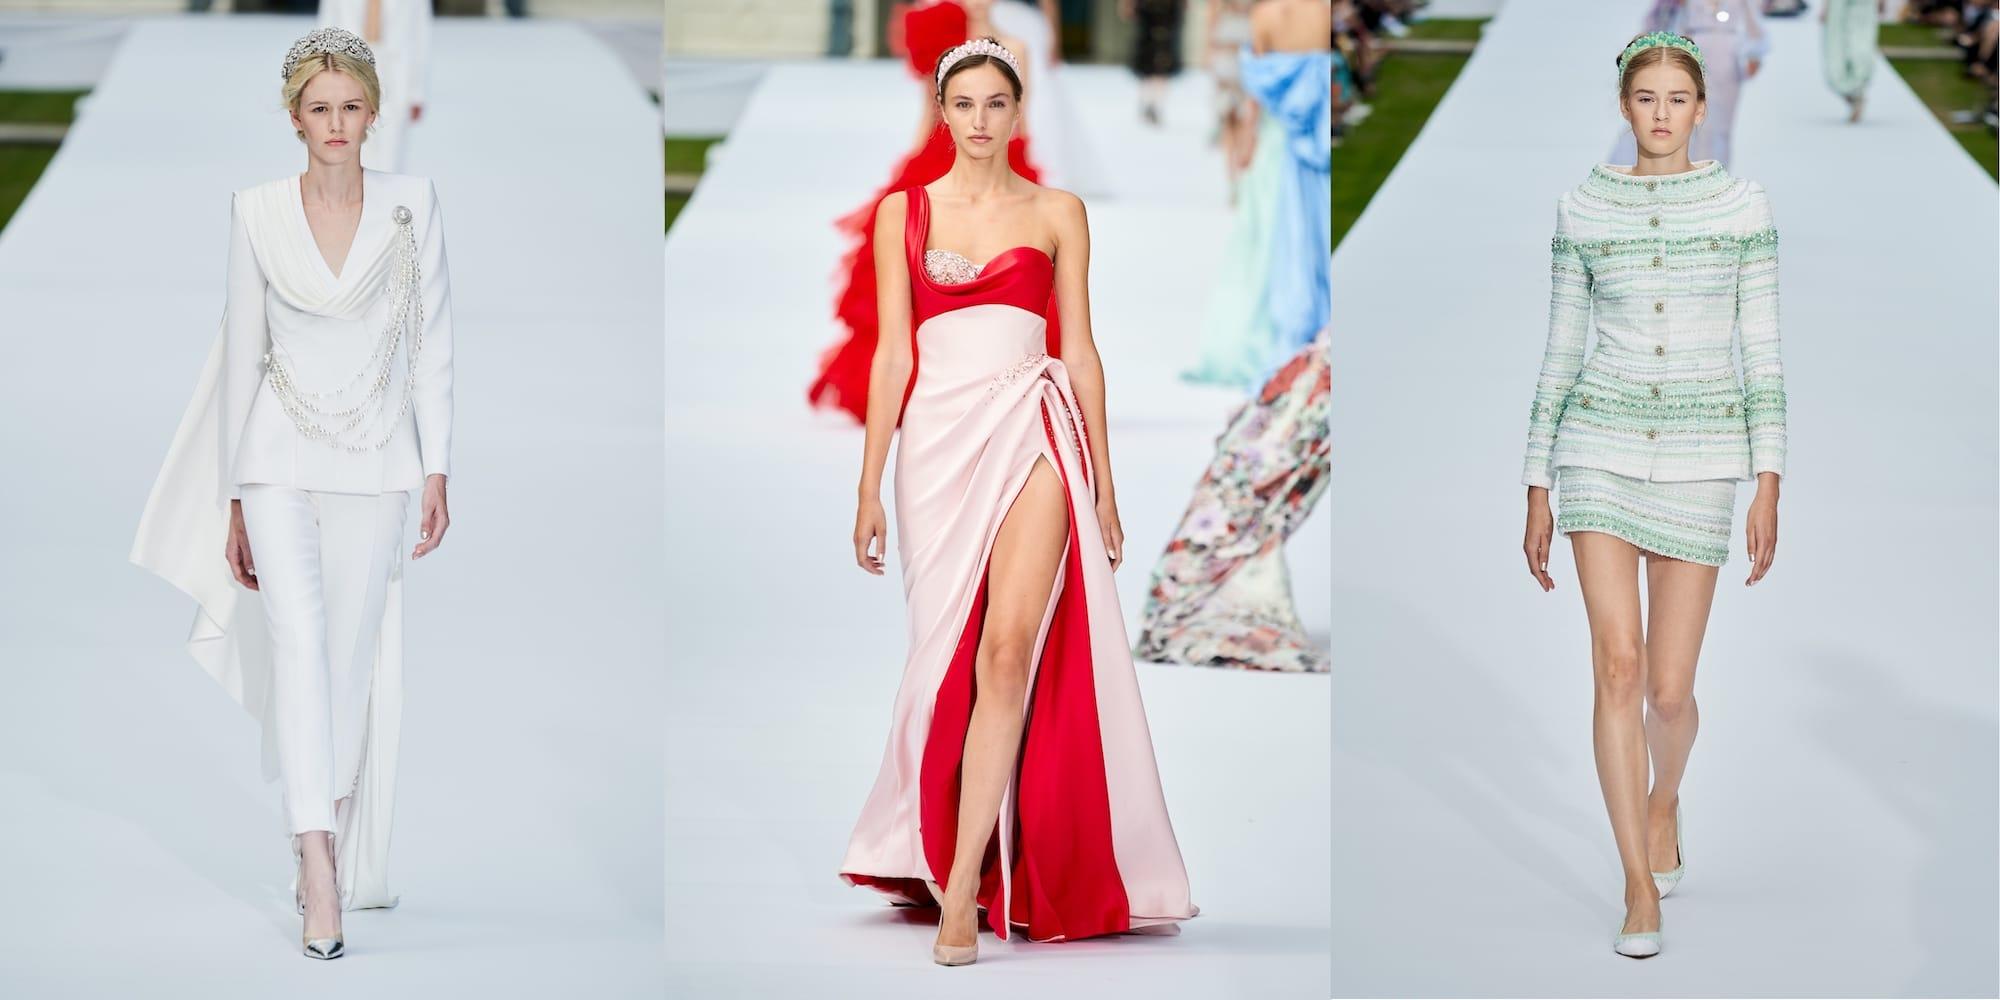 Новая эпоха джаза: коллекция haute couture Ralph & Russo